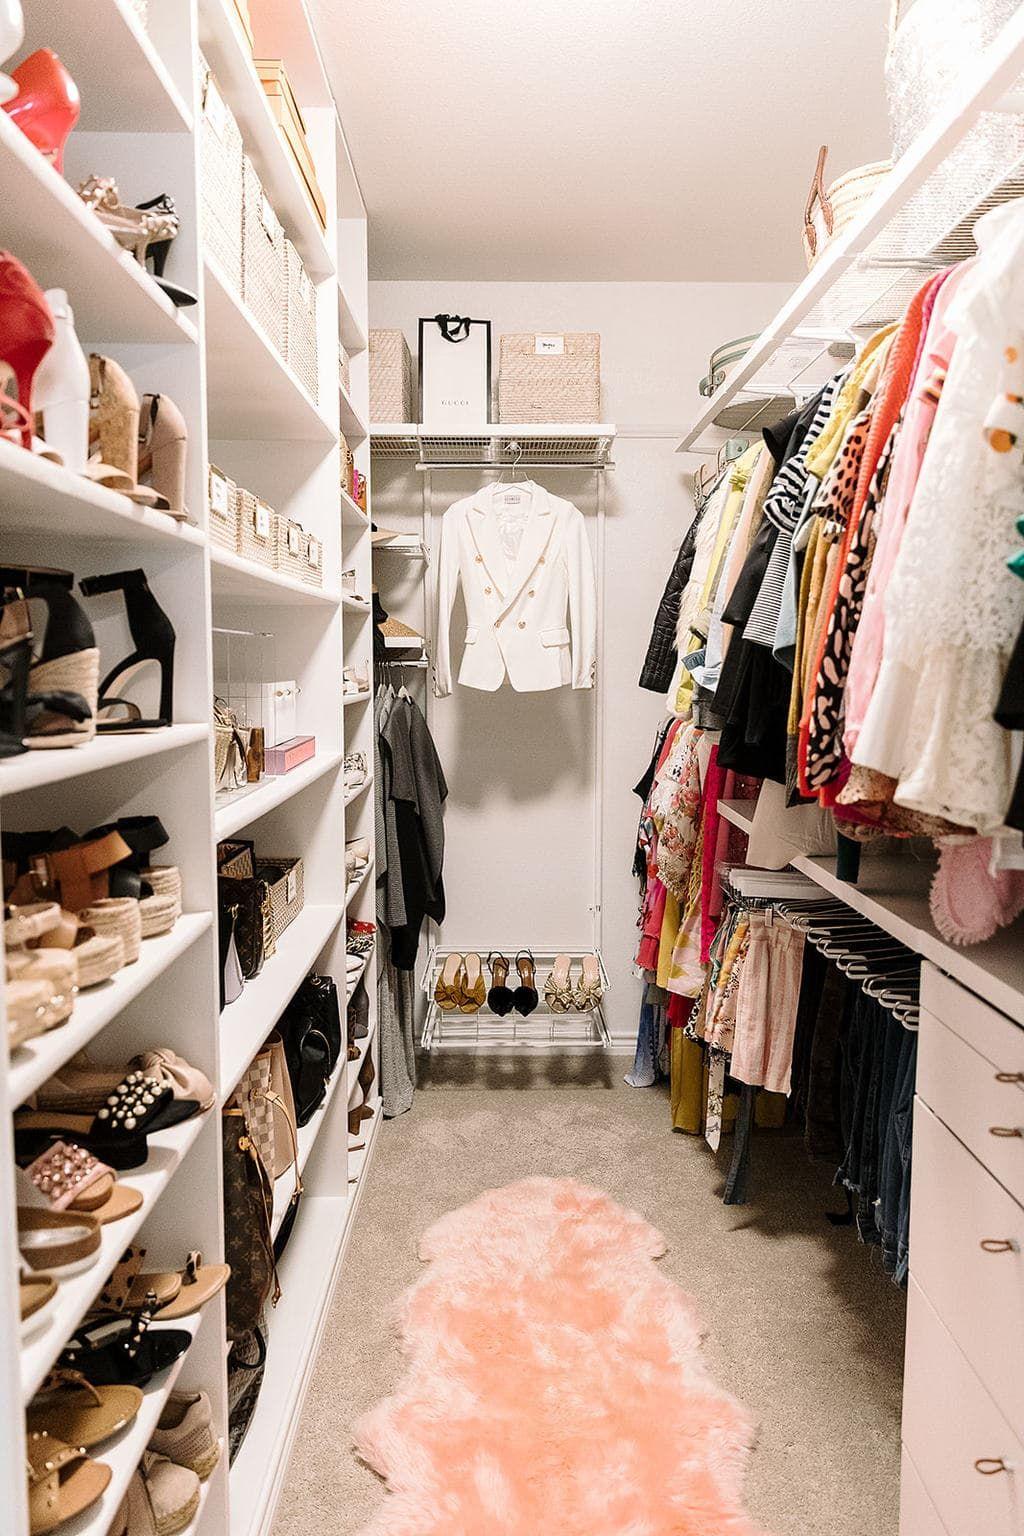 How I Organize My Closet Gorgeous Organized Closet That Keeps Everything In Its Place Closet Organizatio Closet Decor Bedroom Closet Design Closet Layout